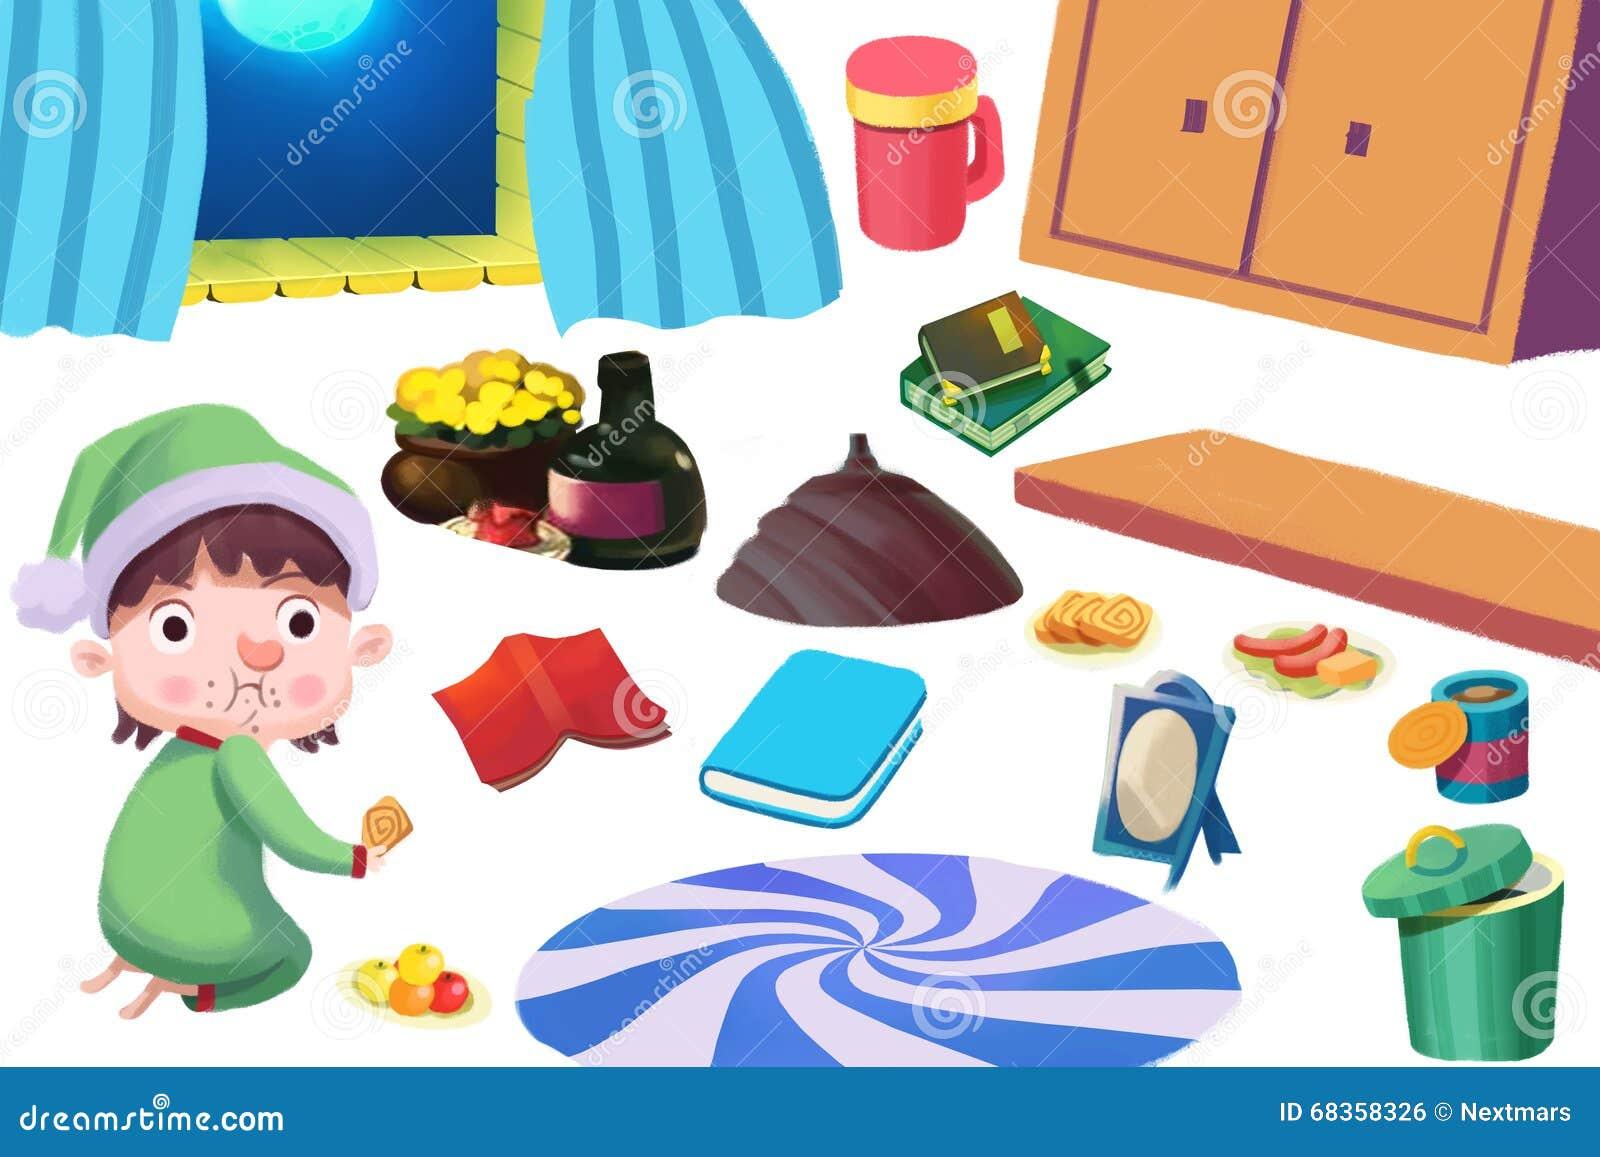 Play kitchen clip art - Royalty Free Illustration Download Clip Art